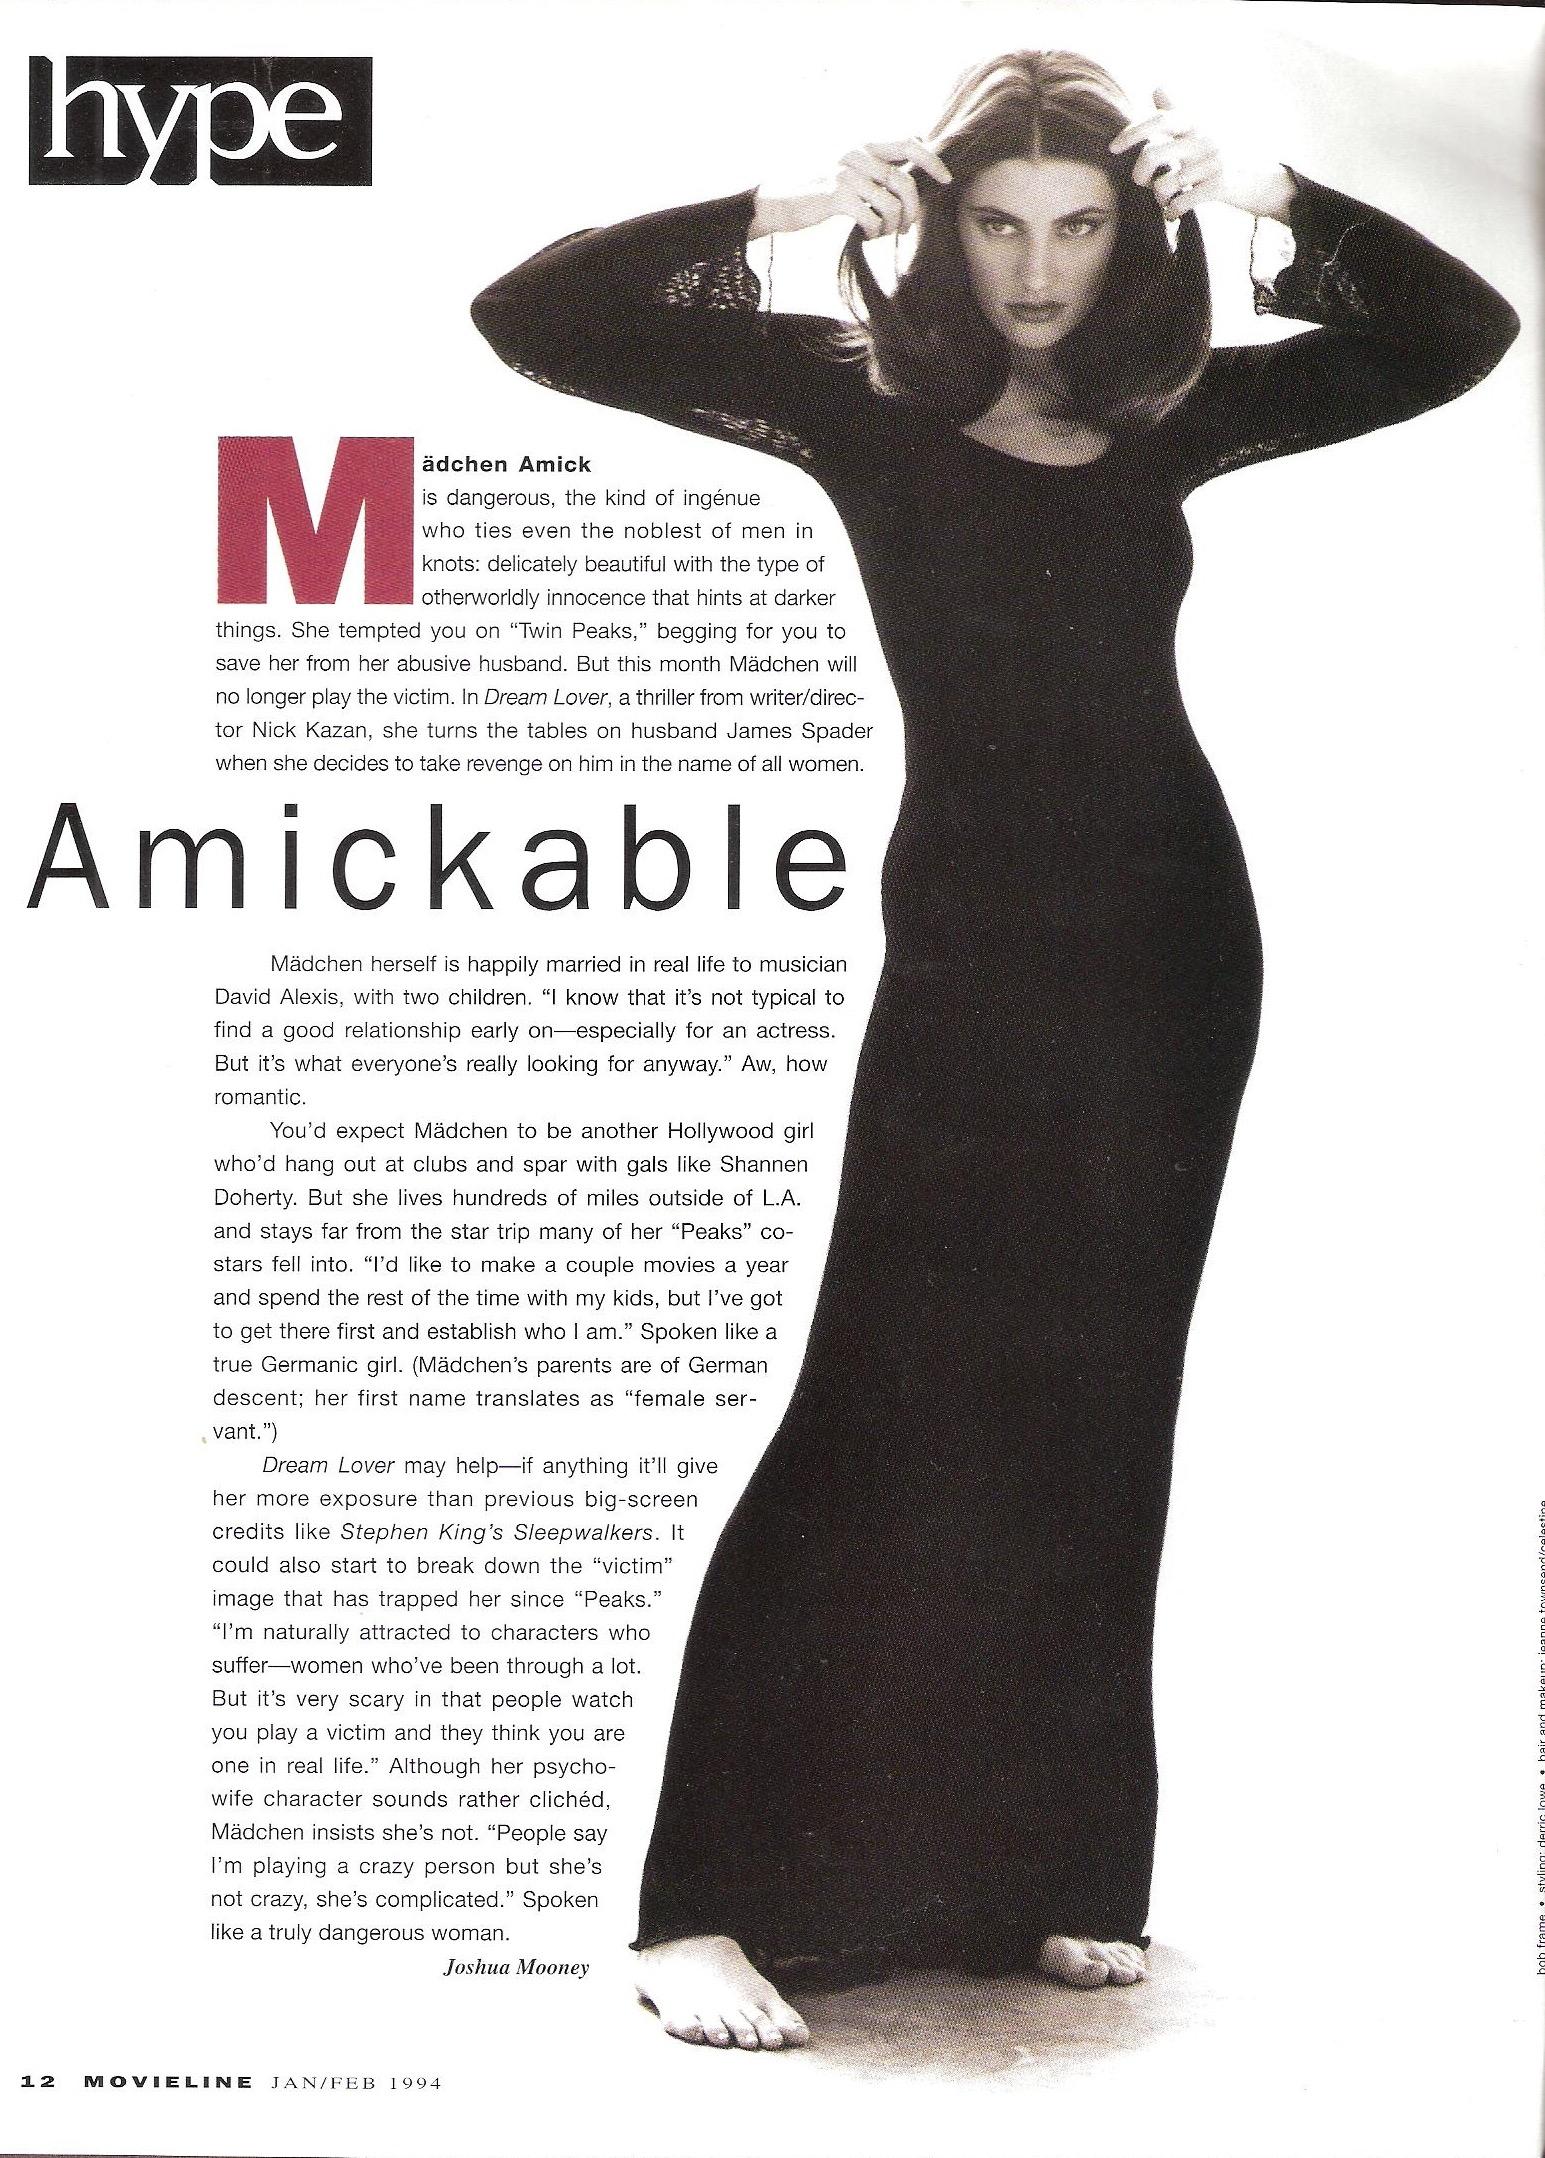 Amickable